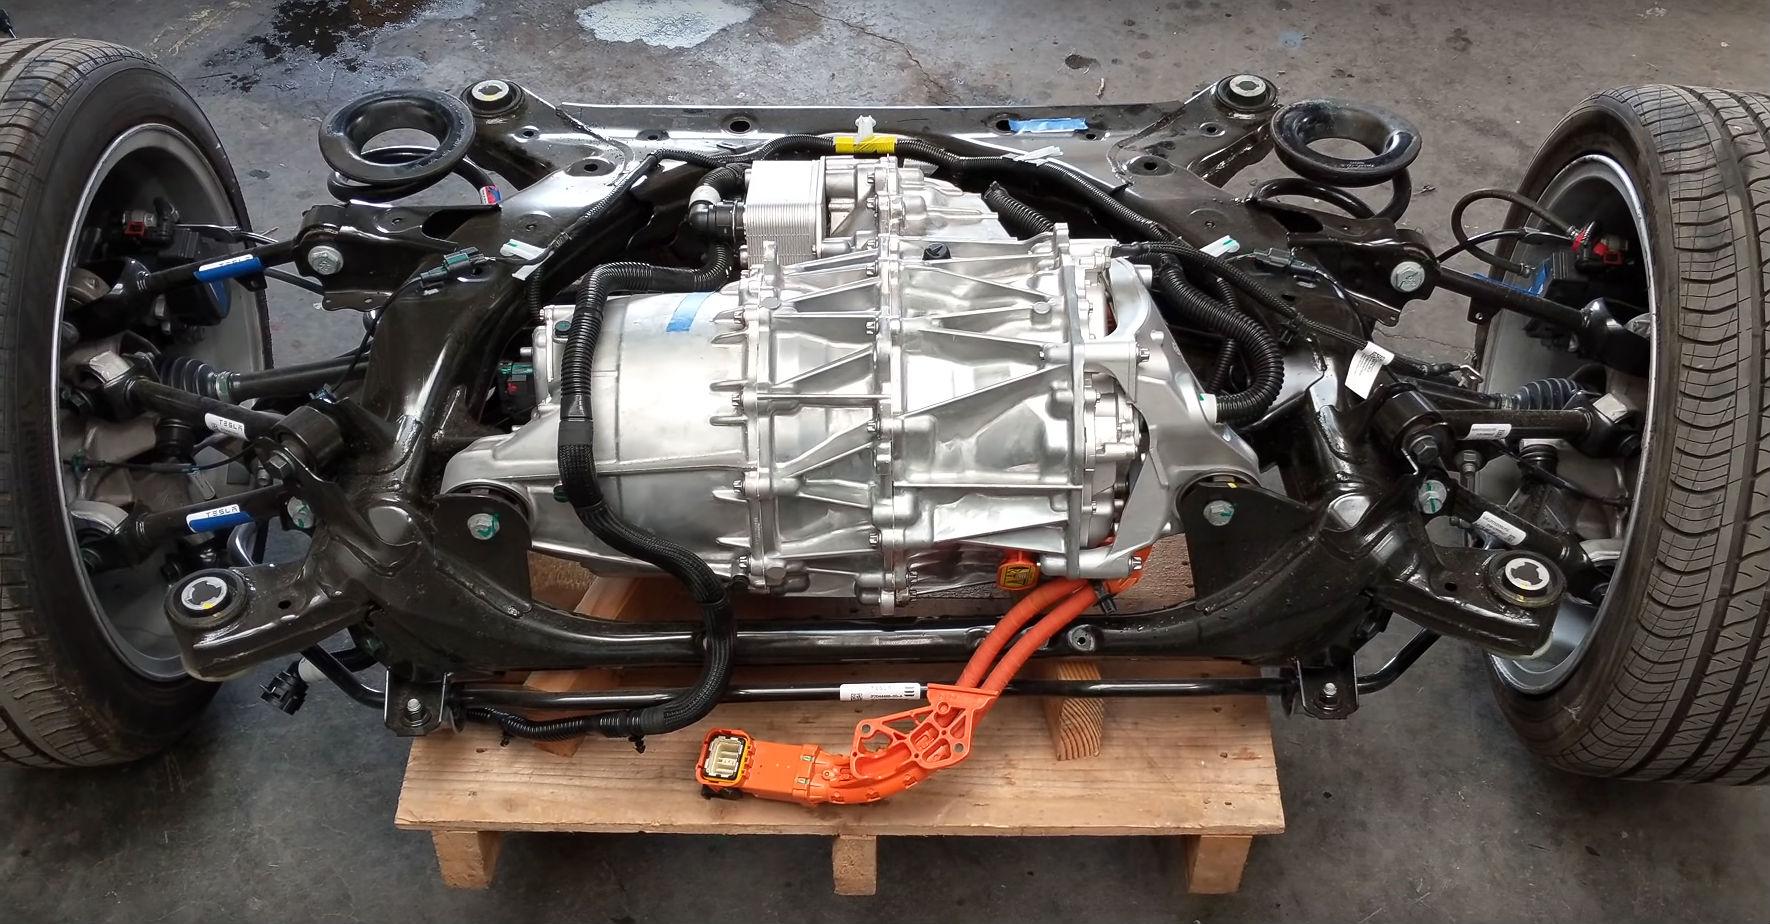 Tesla's simple Model 3 drivetrain design is key to its mass market future